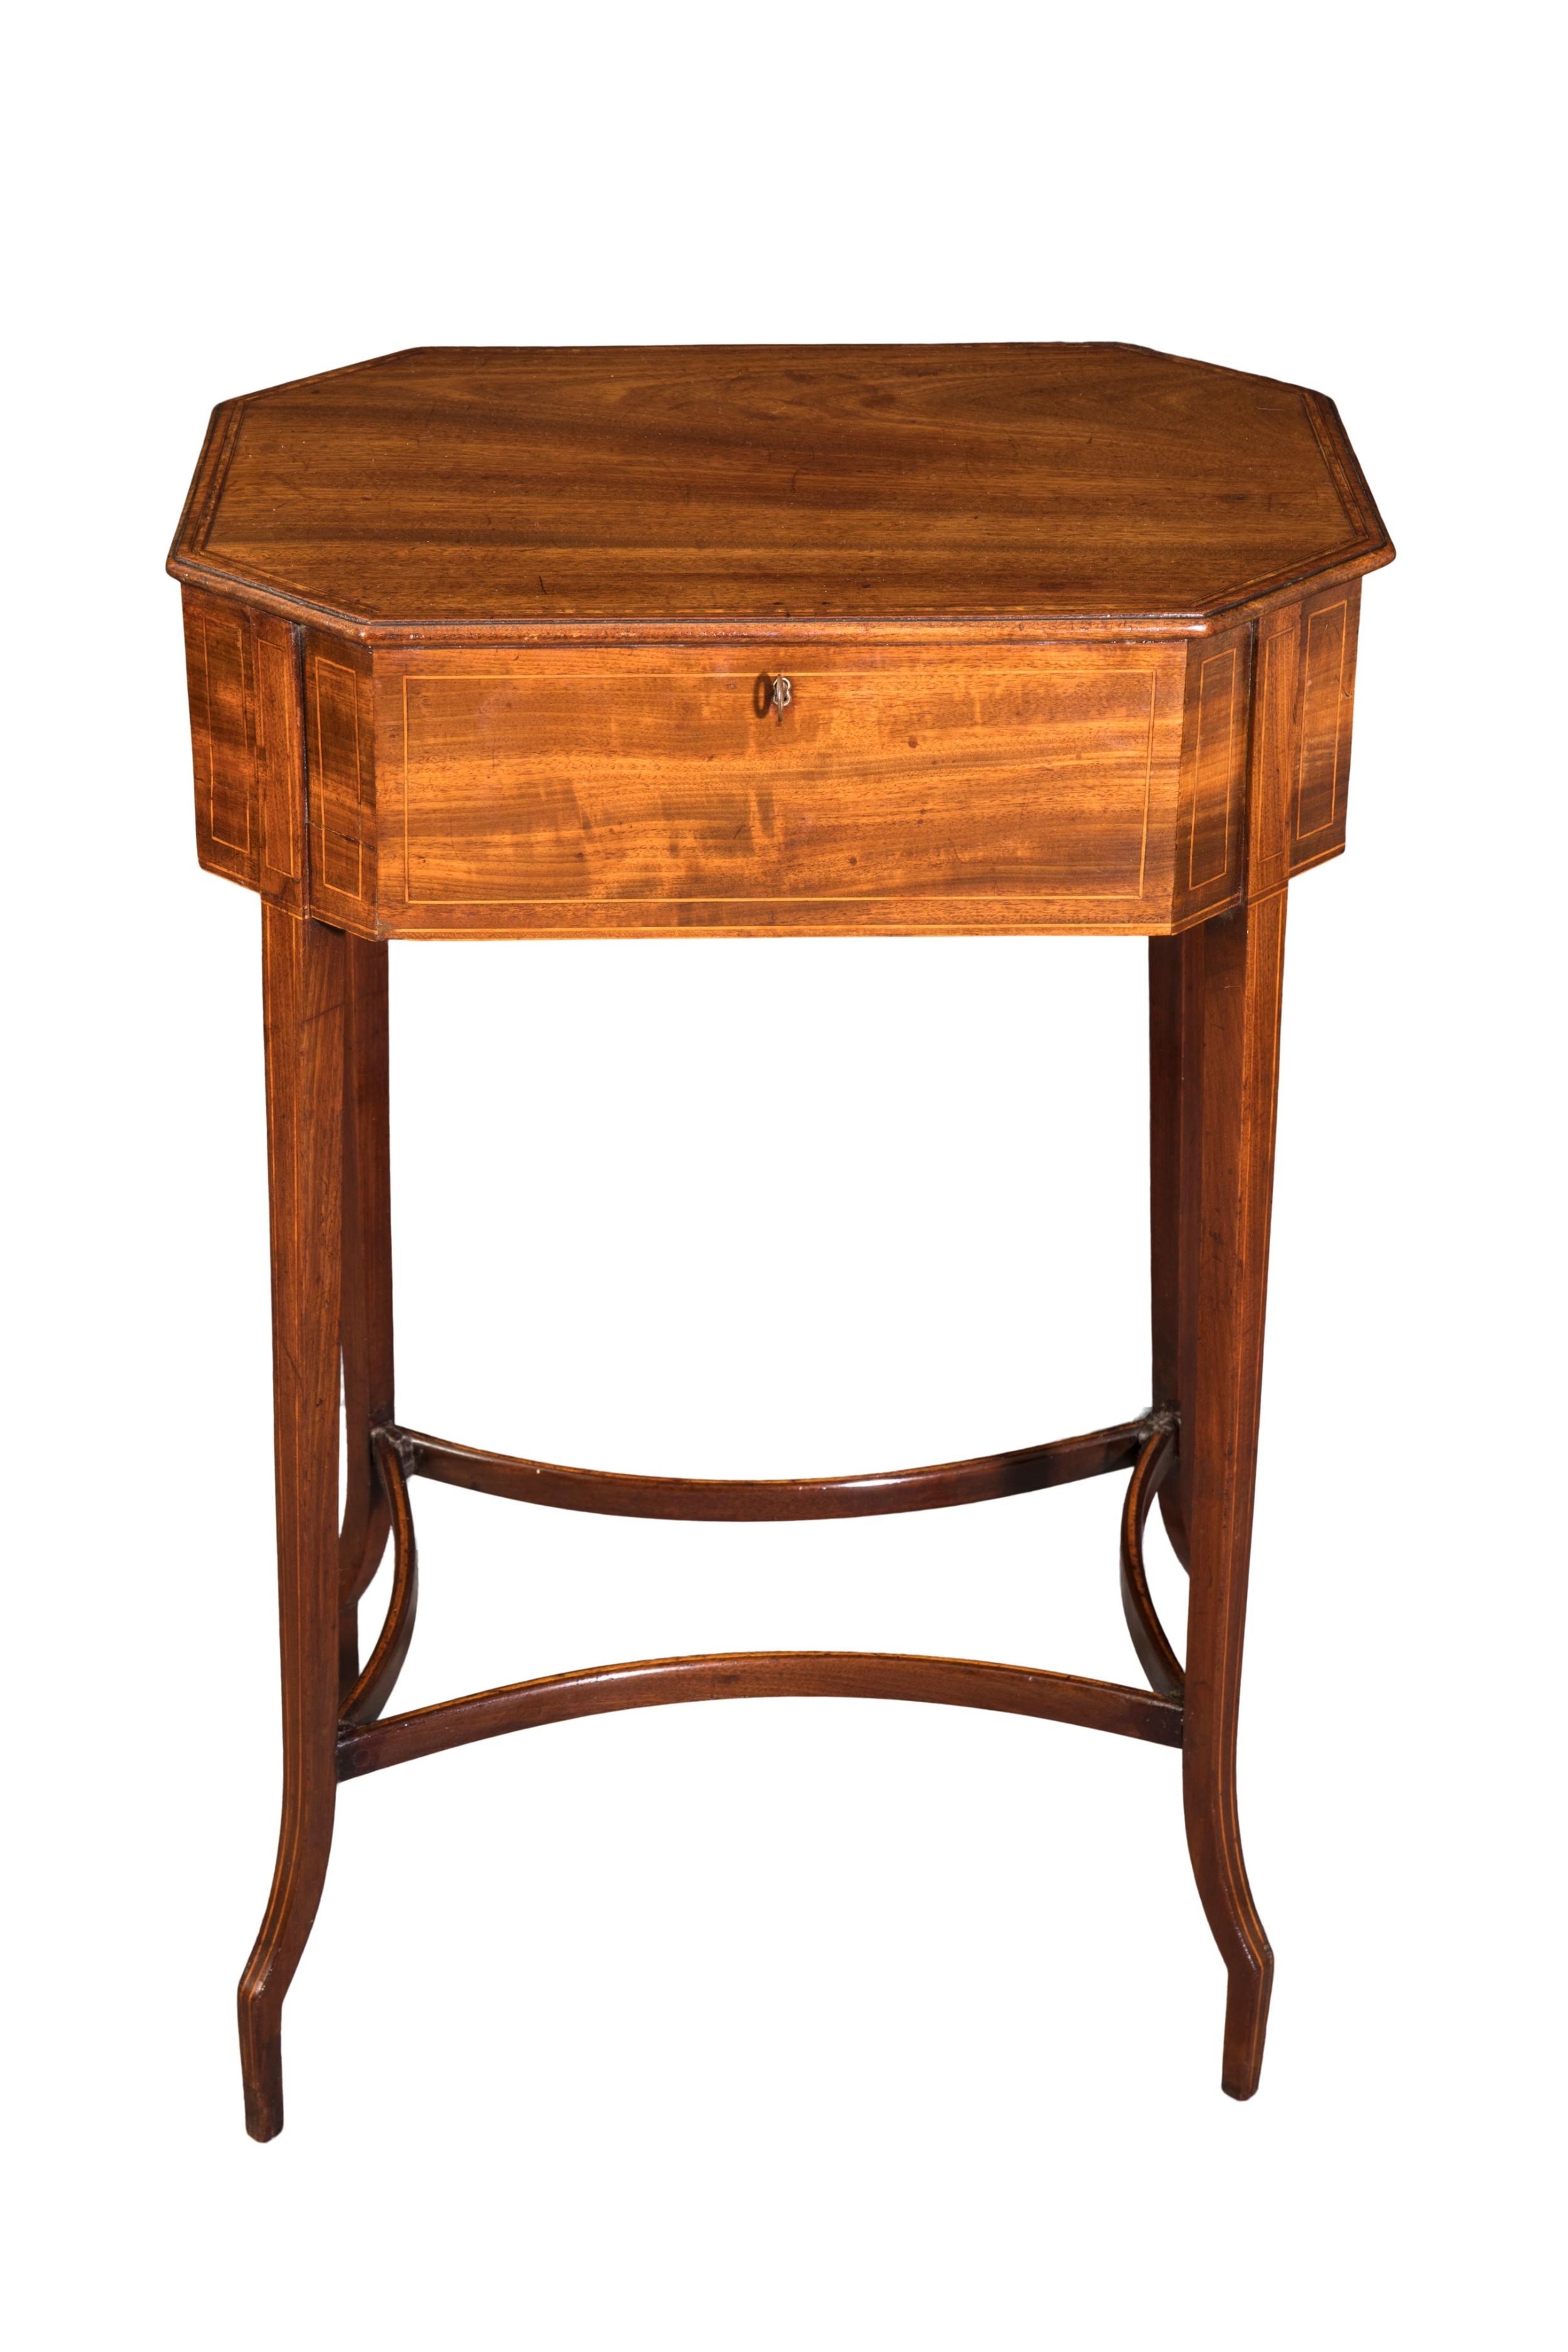 george iii mahogany work table circa 1810